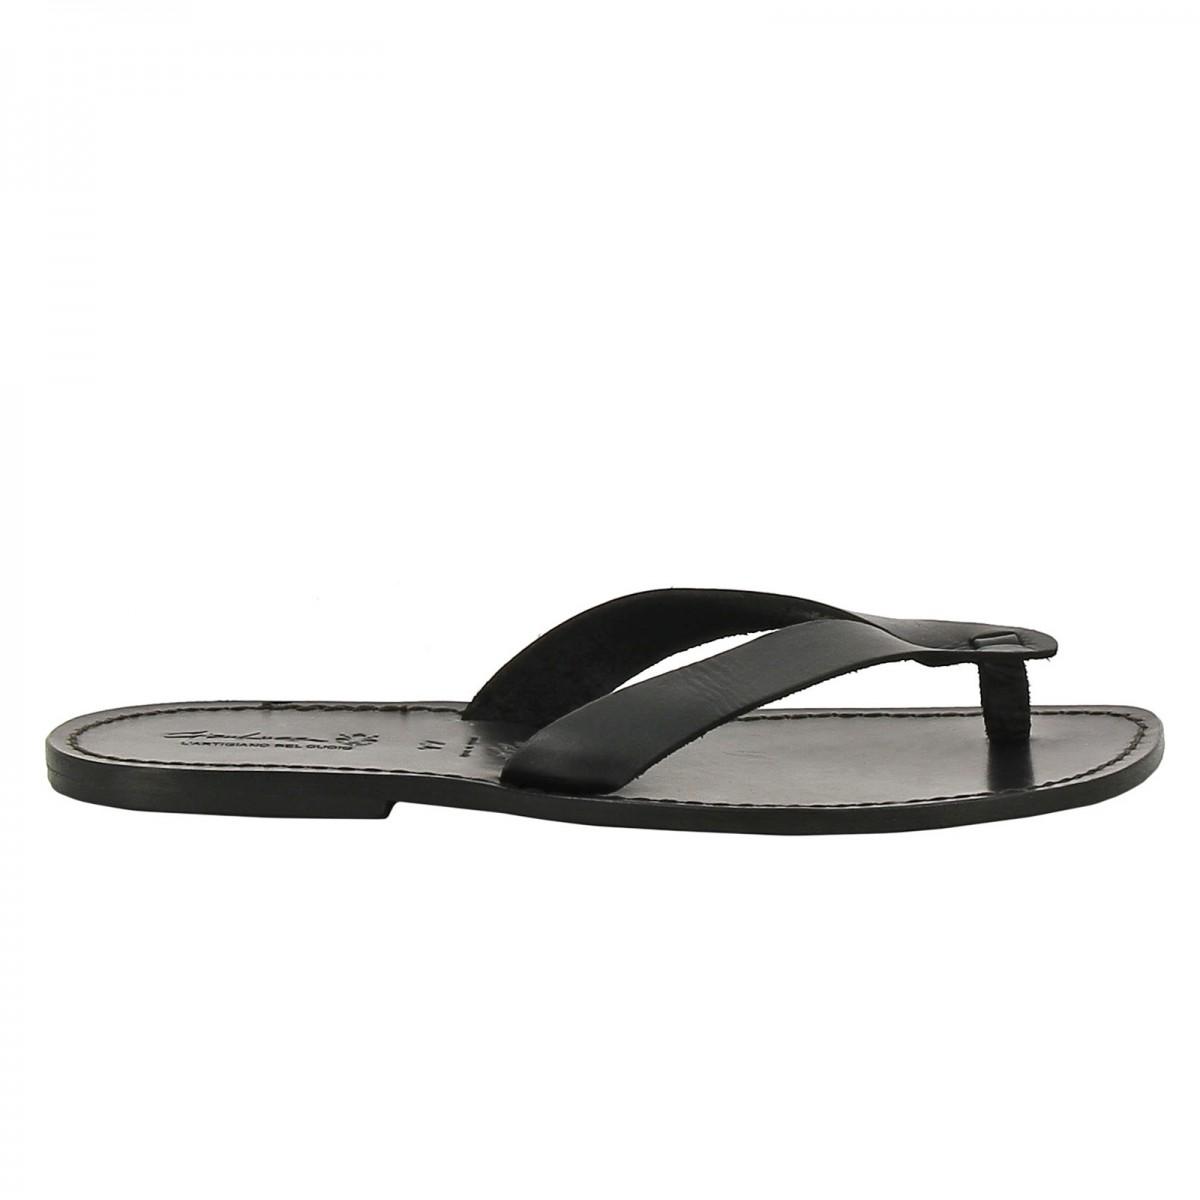 handgefertigte schwarze flip flops herren sandalen mit. Black Bedroom Furniture Sets. Home Design Ideas